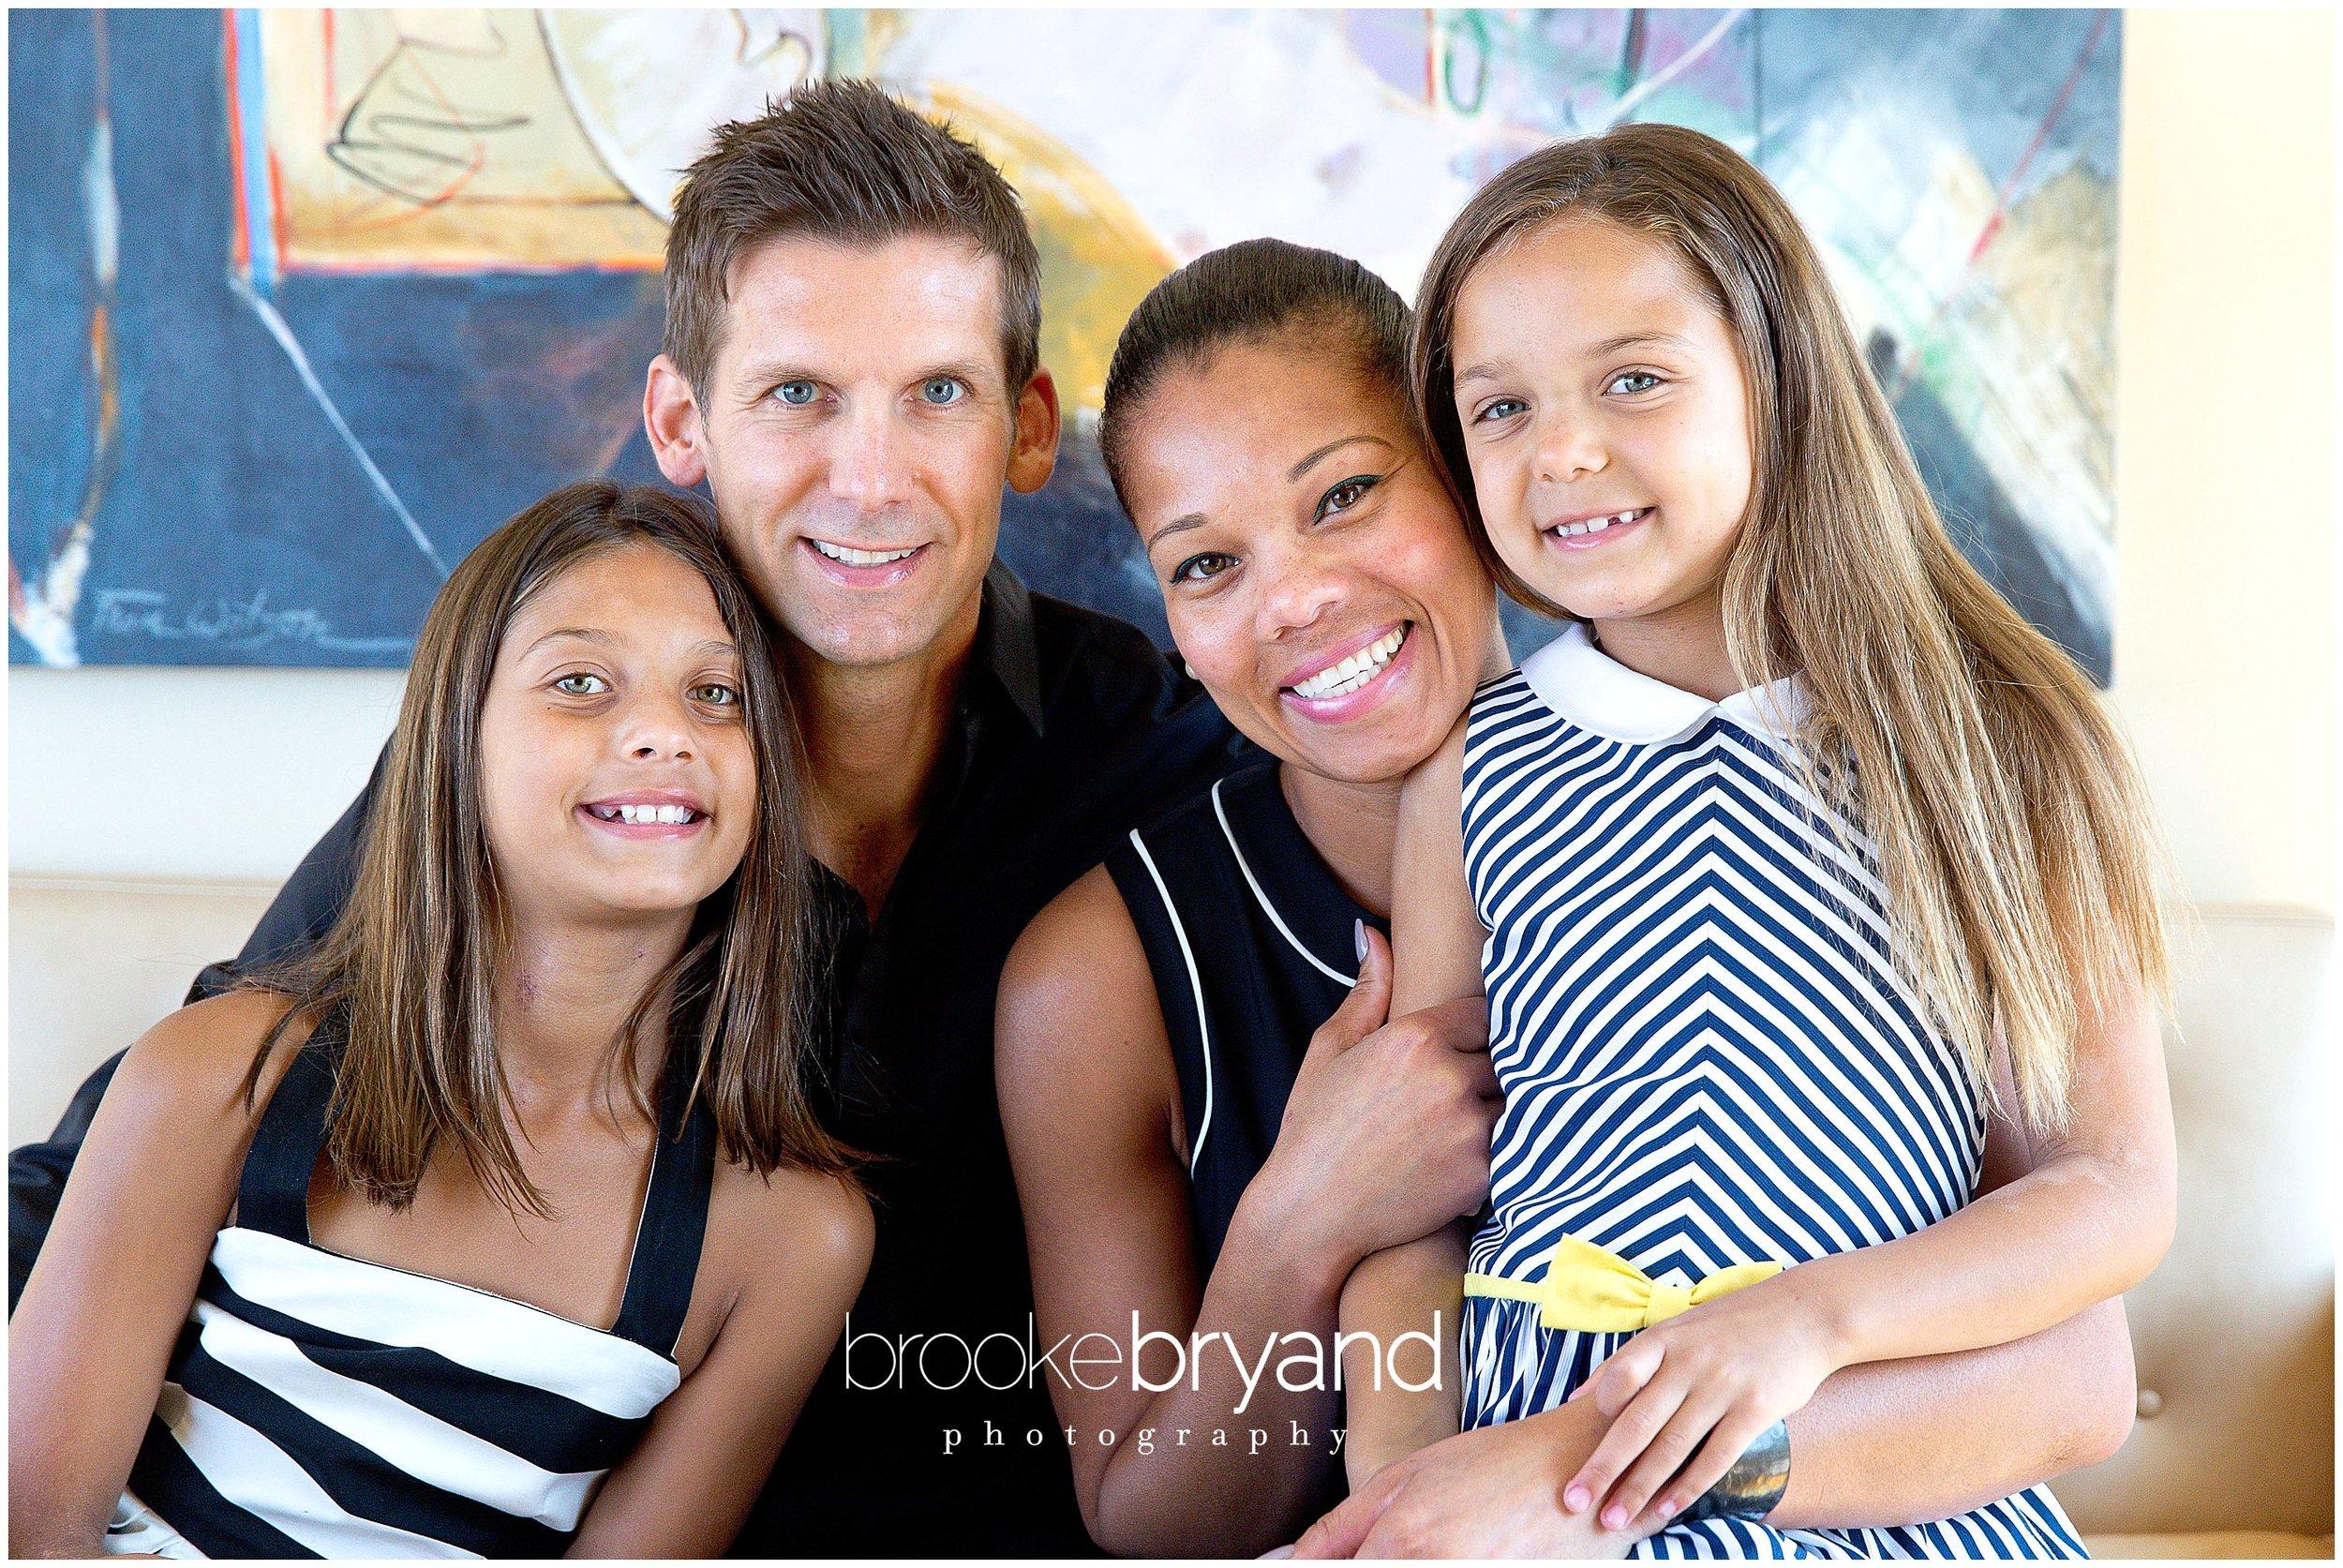 06.2014-Hudson-BBP_3479-Brooke-Bryand-Photography-San-Francisco-Family-Photographer_San-Francisco-Family-Photos-Brooke-Bryand-Photography.jpg